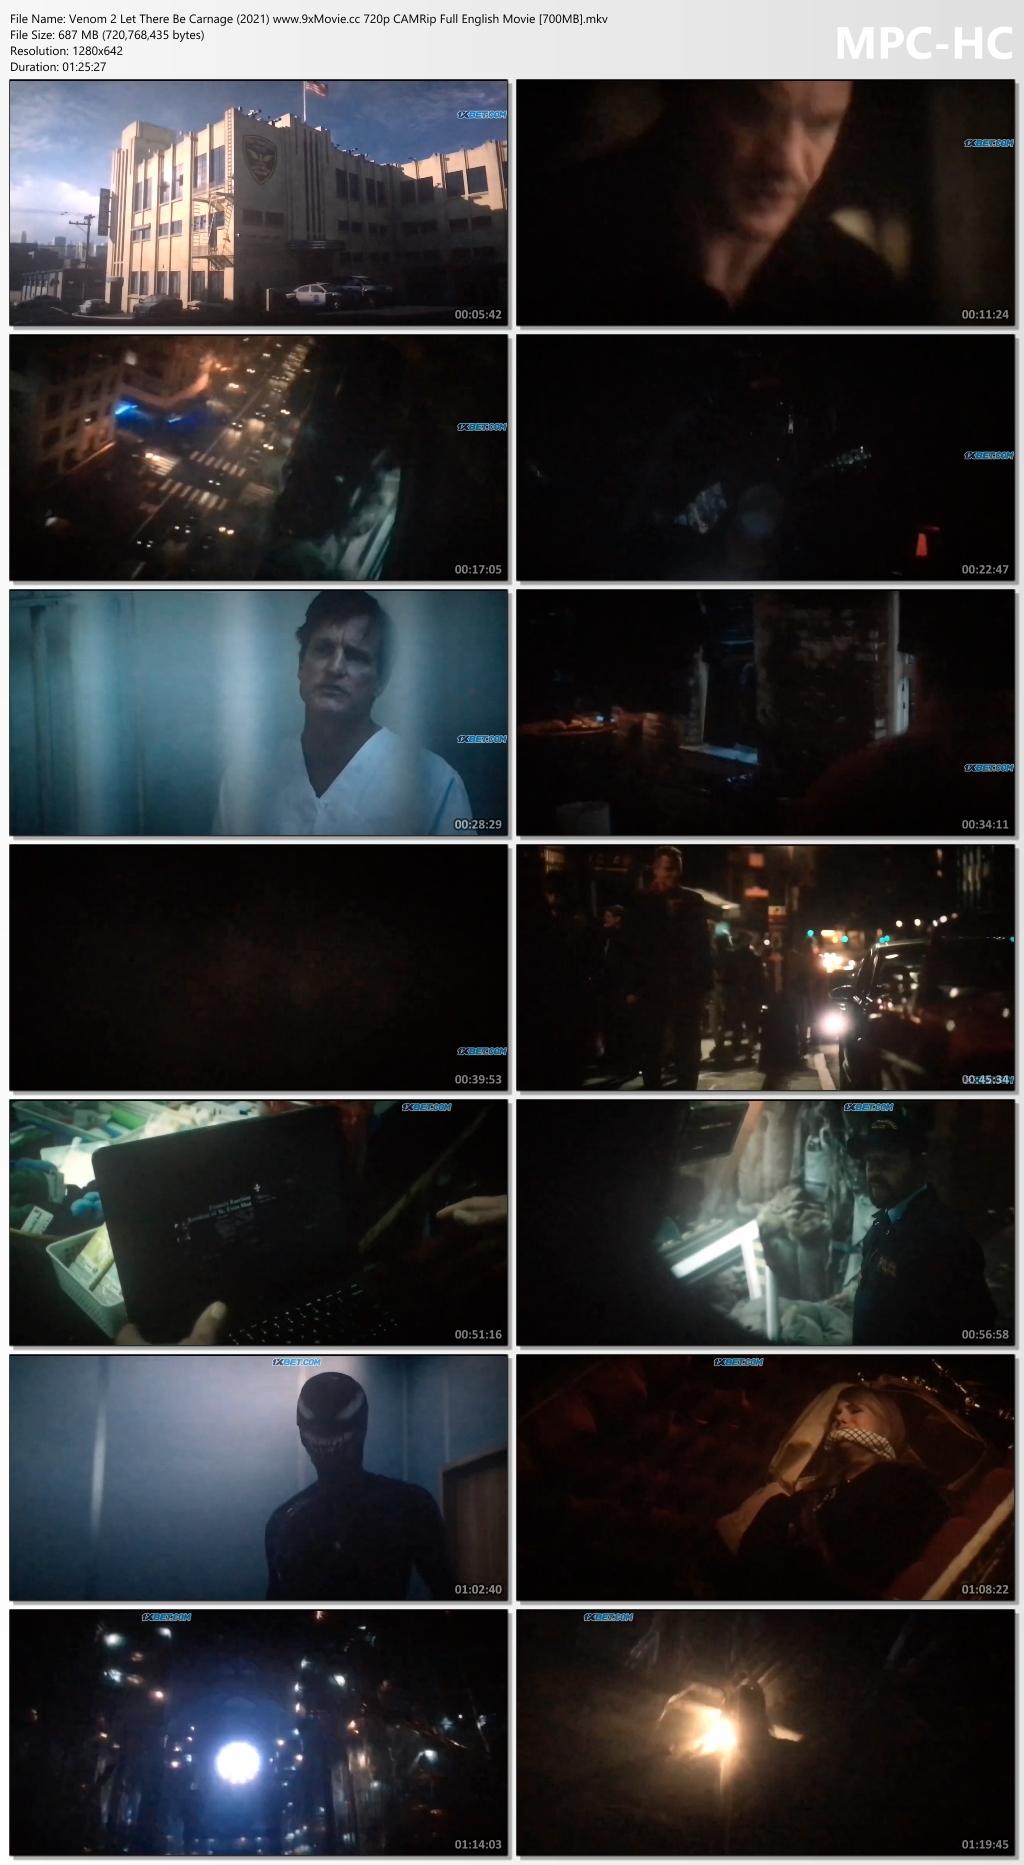 Venom-2-Let-There-Be-Carnage-2021-www-9x-Movie-cc-720p-CAMRip-Full-English-Movie-700-MB-mkv